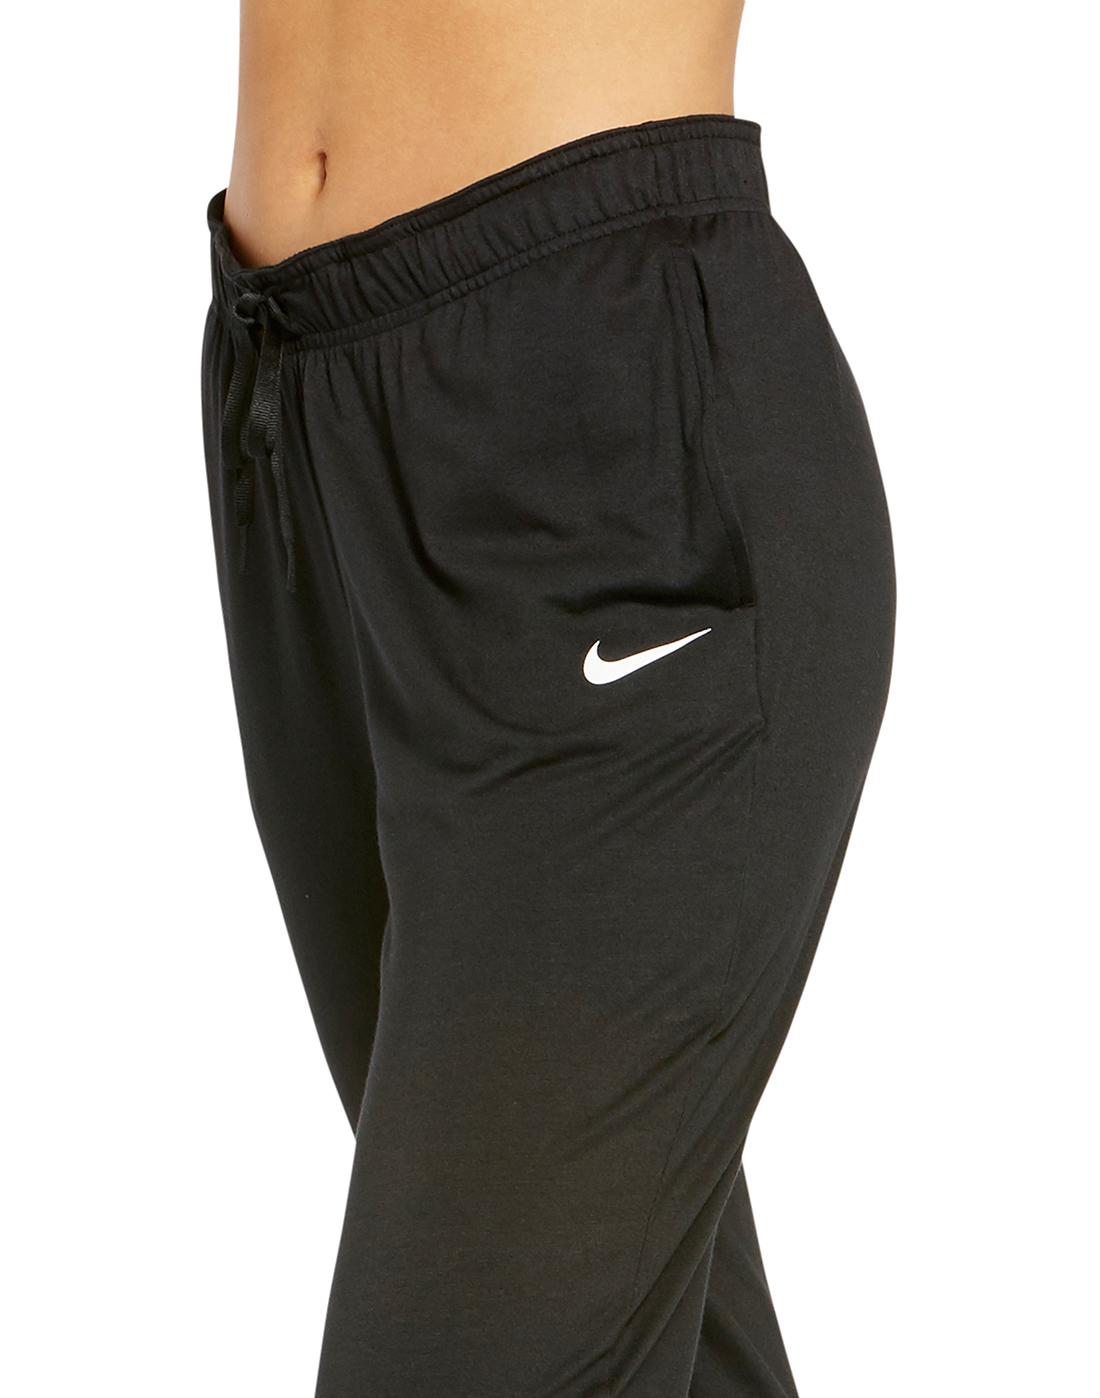 a740a6f9b4b0 Nike Womens Flow Yoga Pant